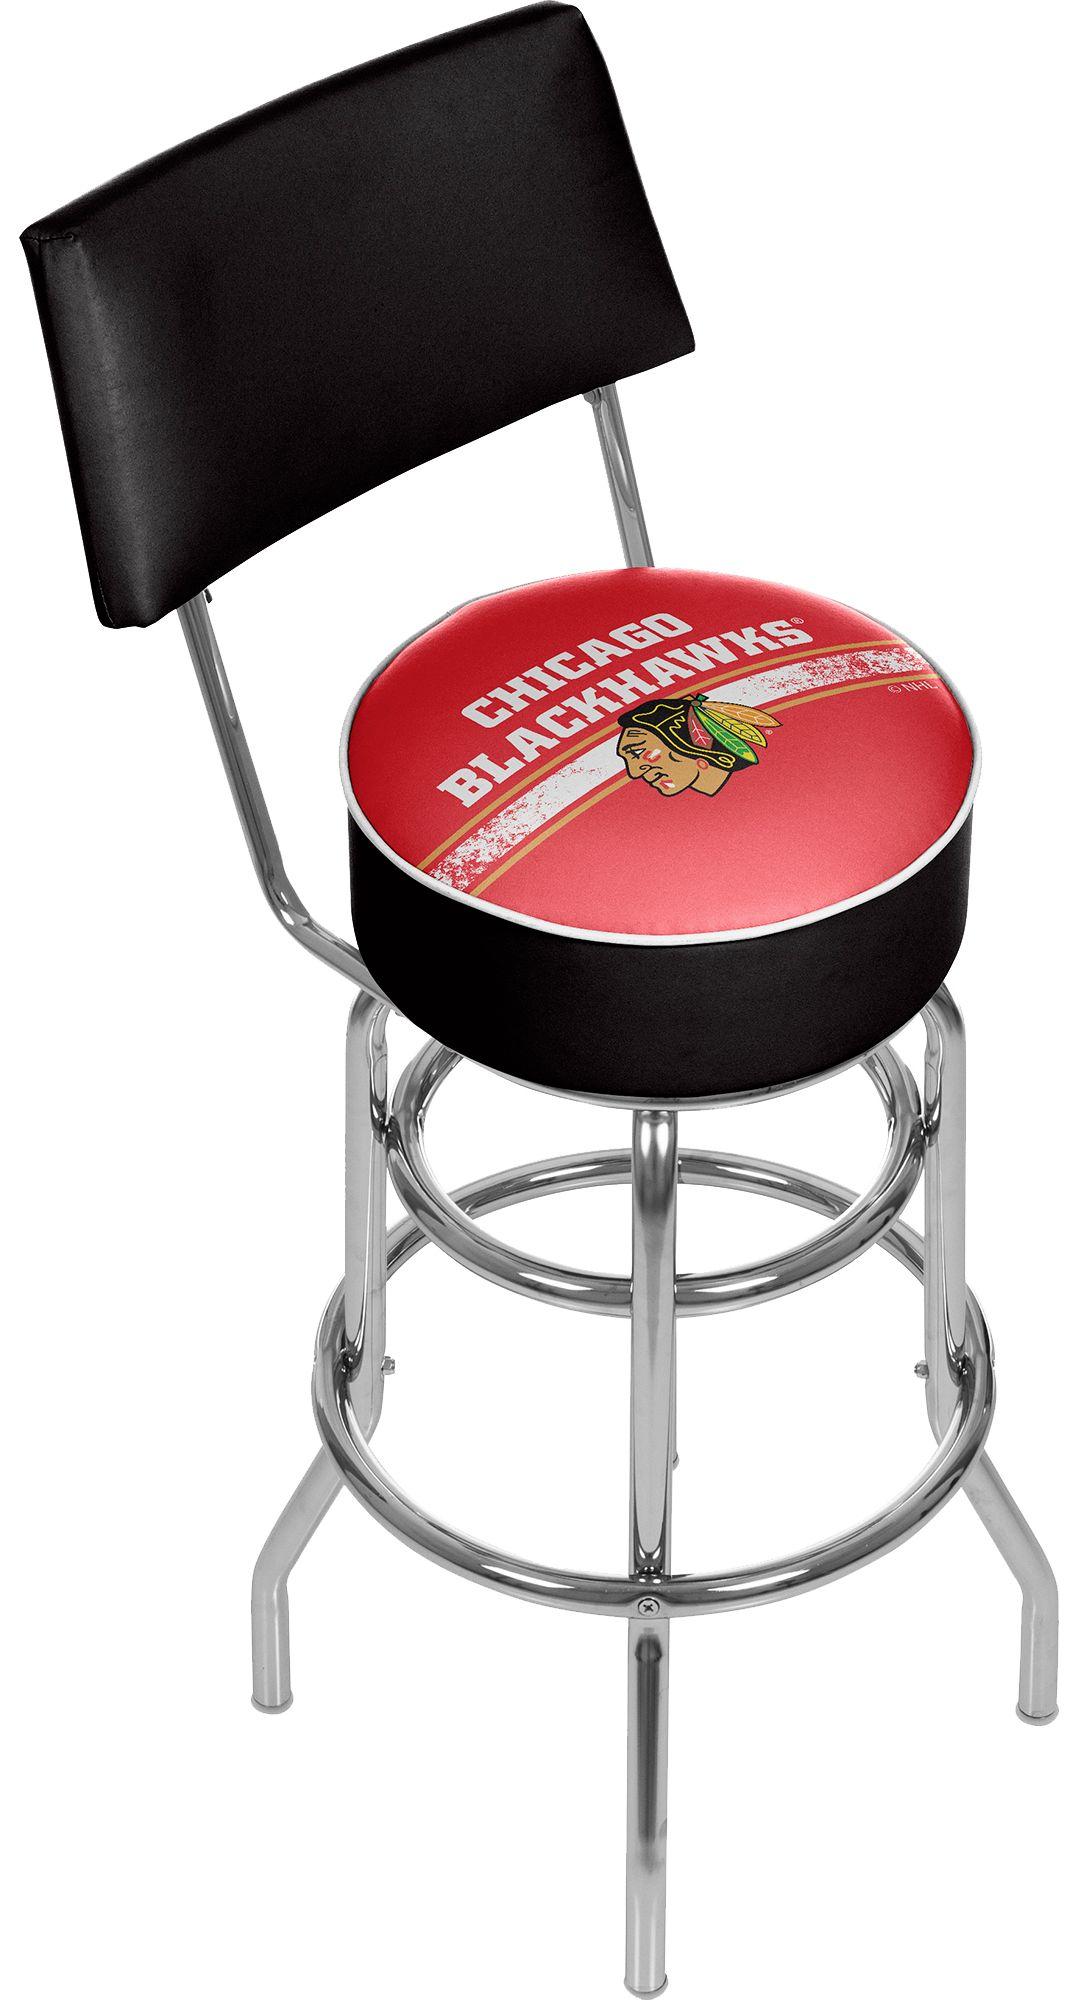 Brilliant Trademark Games Chicago Blackhawks Padded Swivel Bar Stool With Back Dailytribune Chair Design For Home Dailytribuneorg